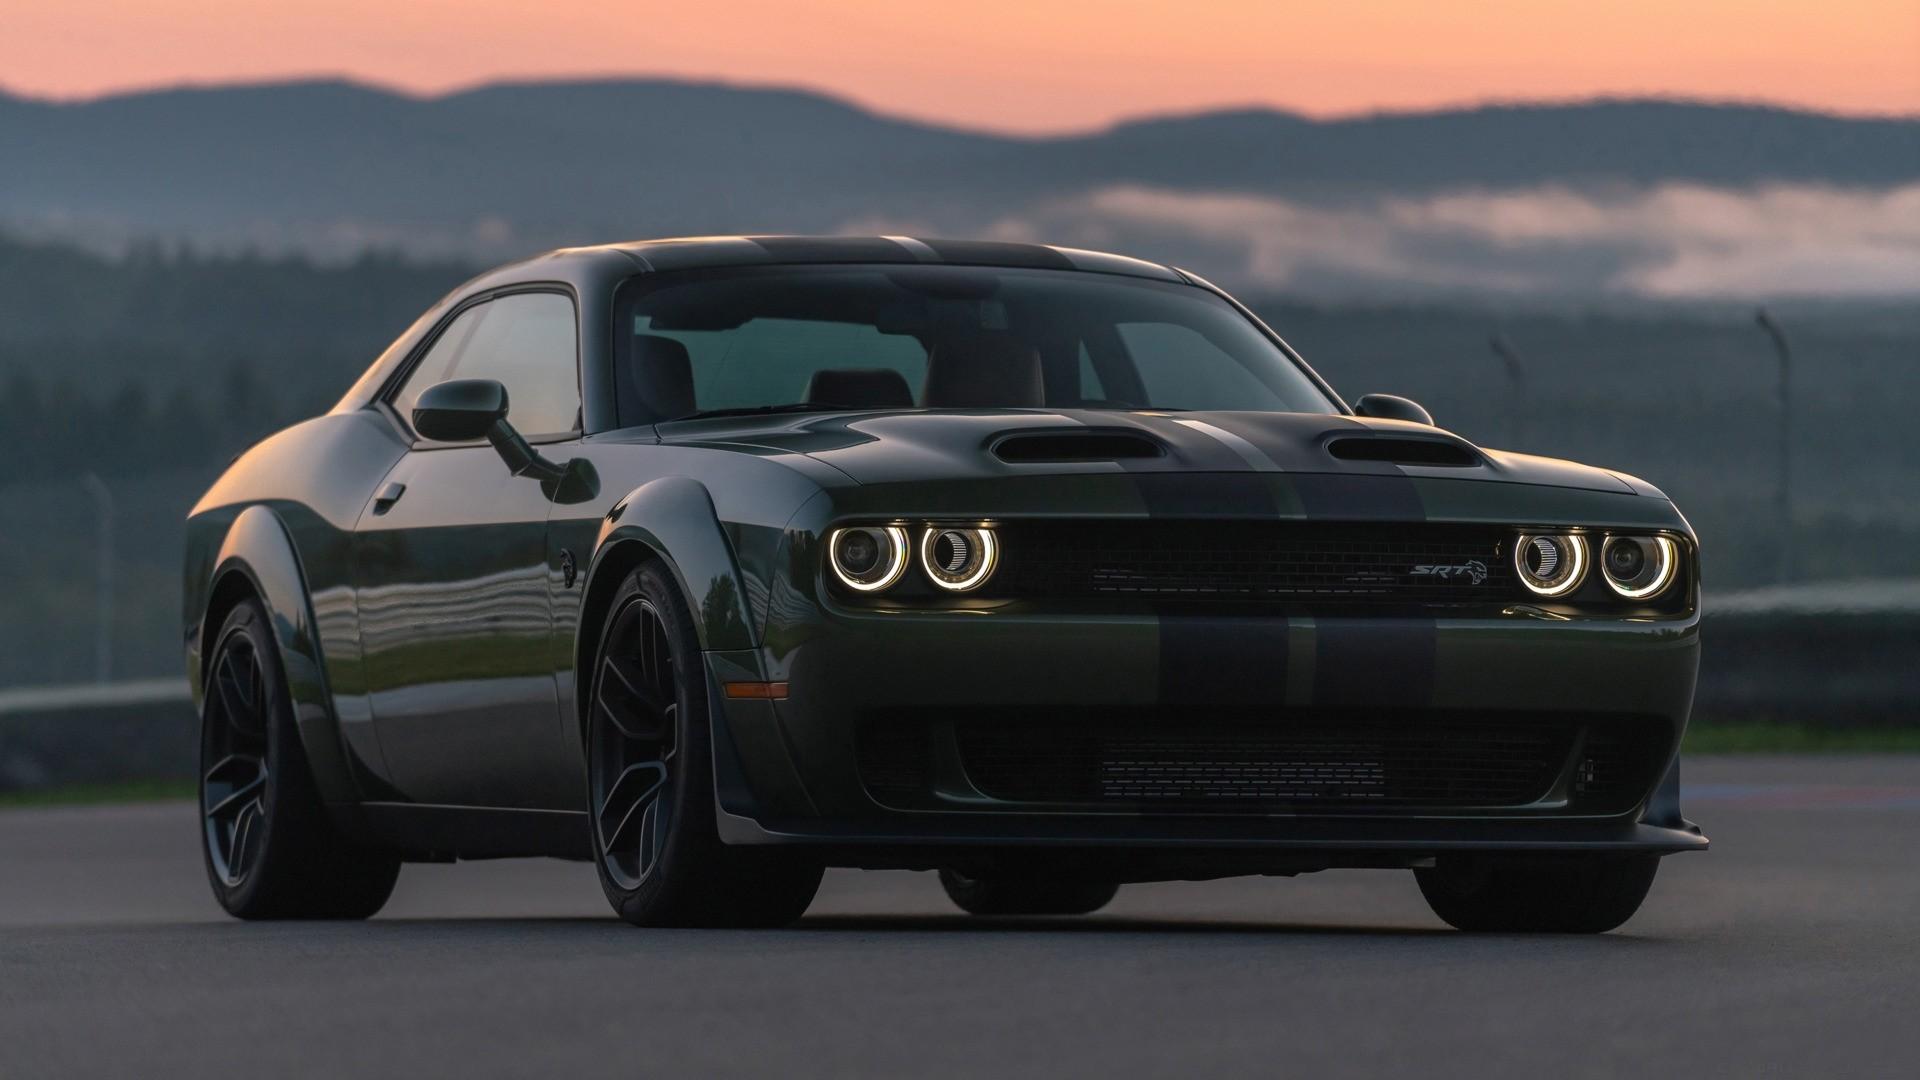 Dodge Challenger Srt Hellcat Wallpaper Pic